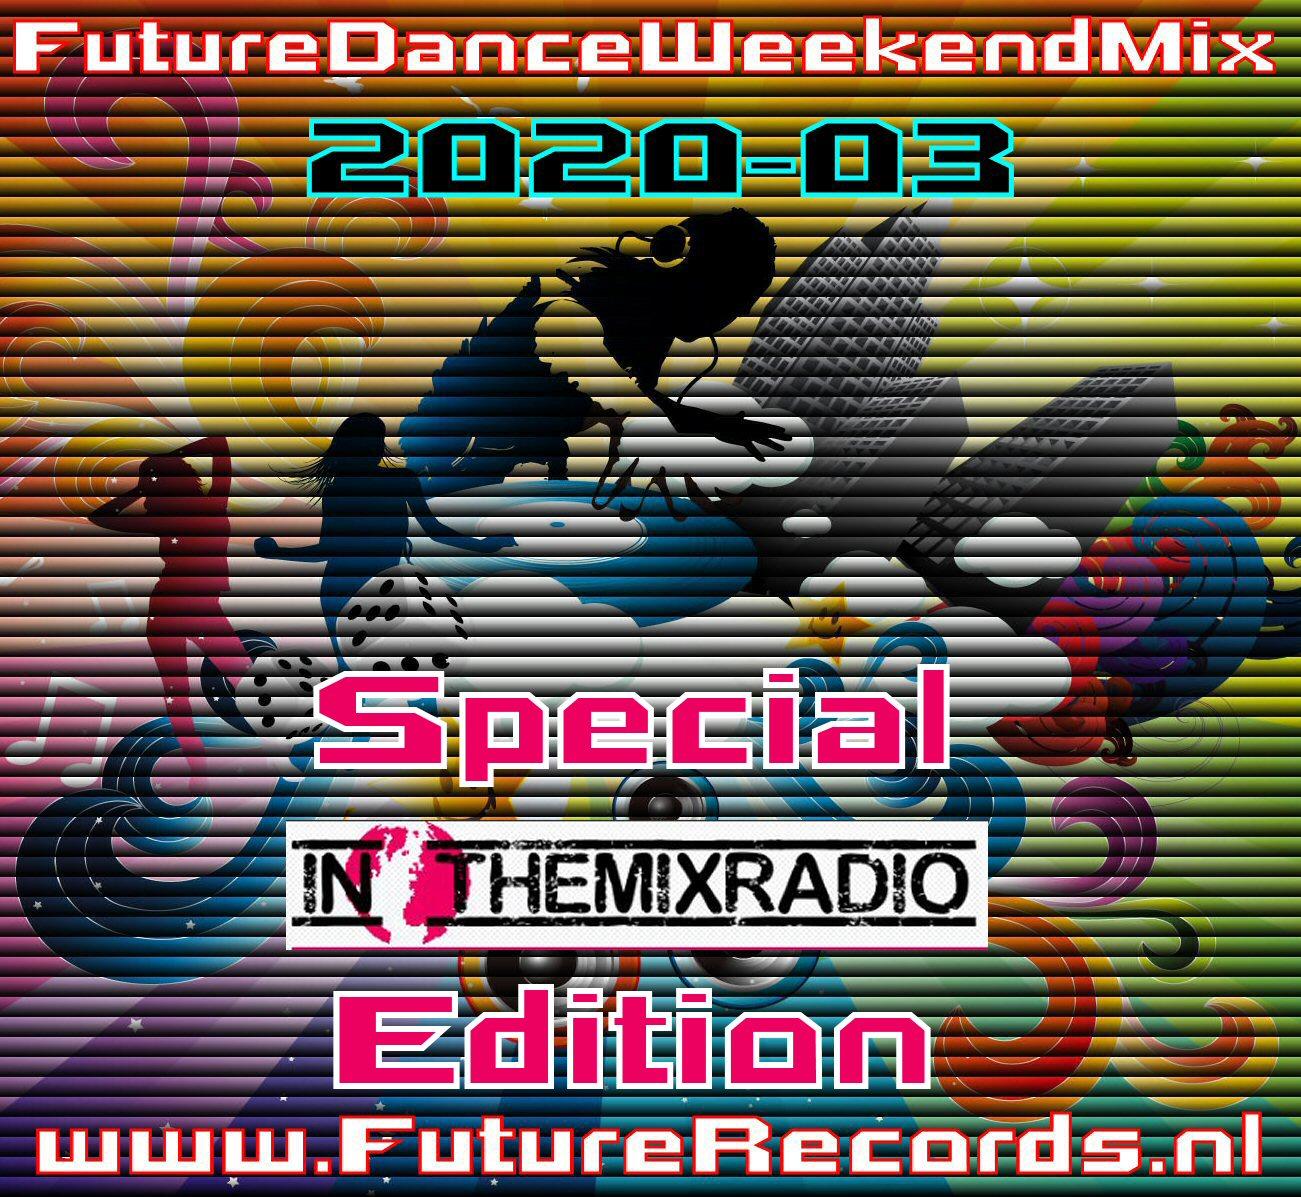 Future Dance Weekend Mix 2020-03